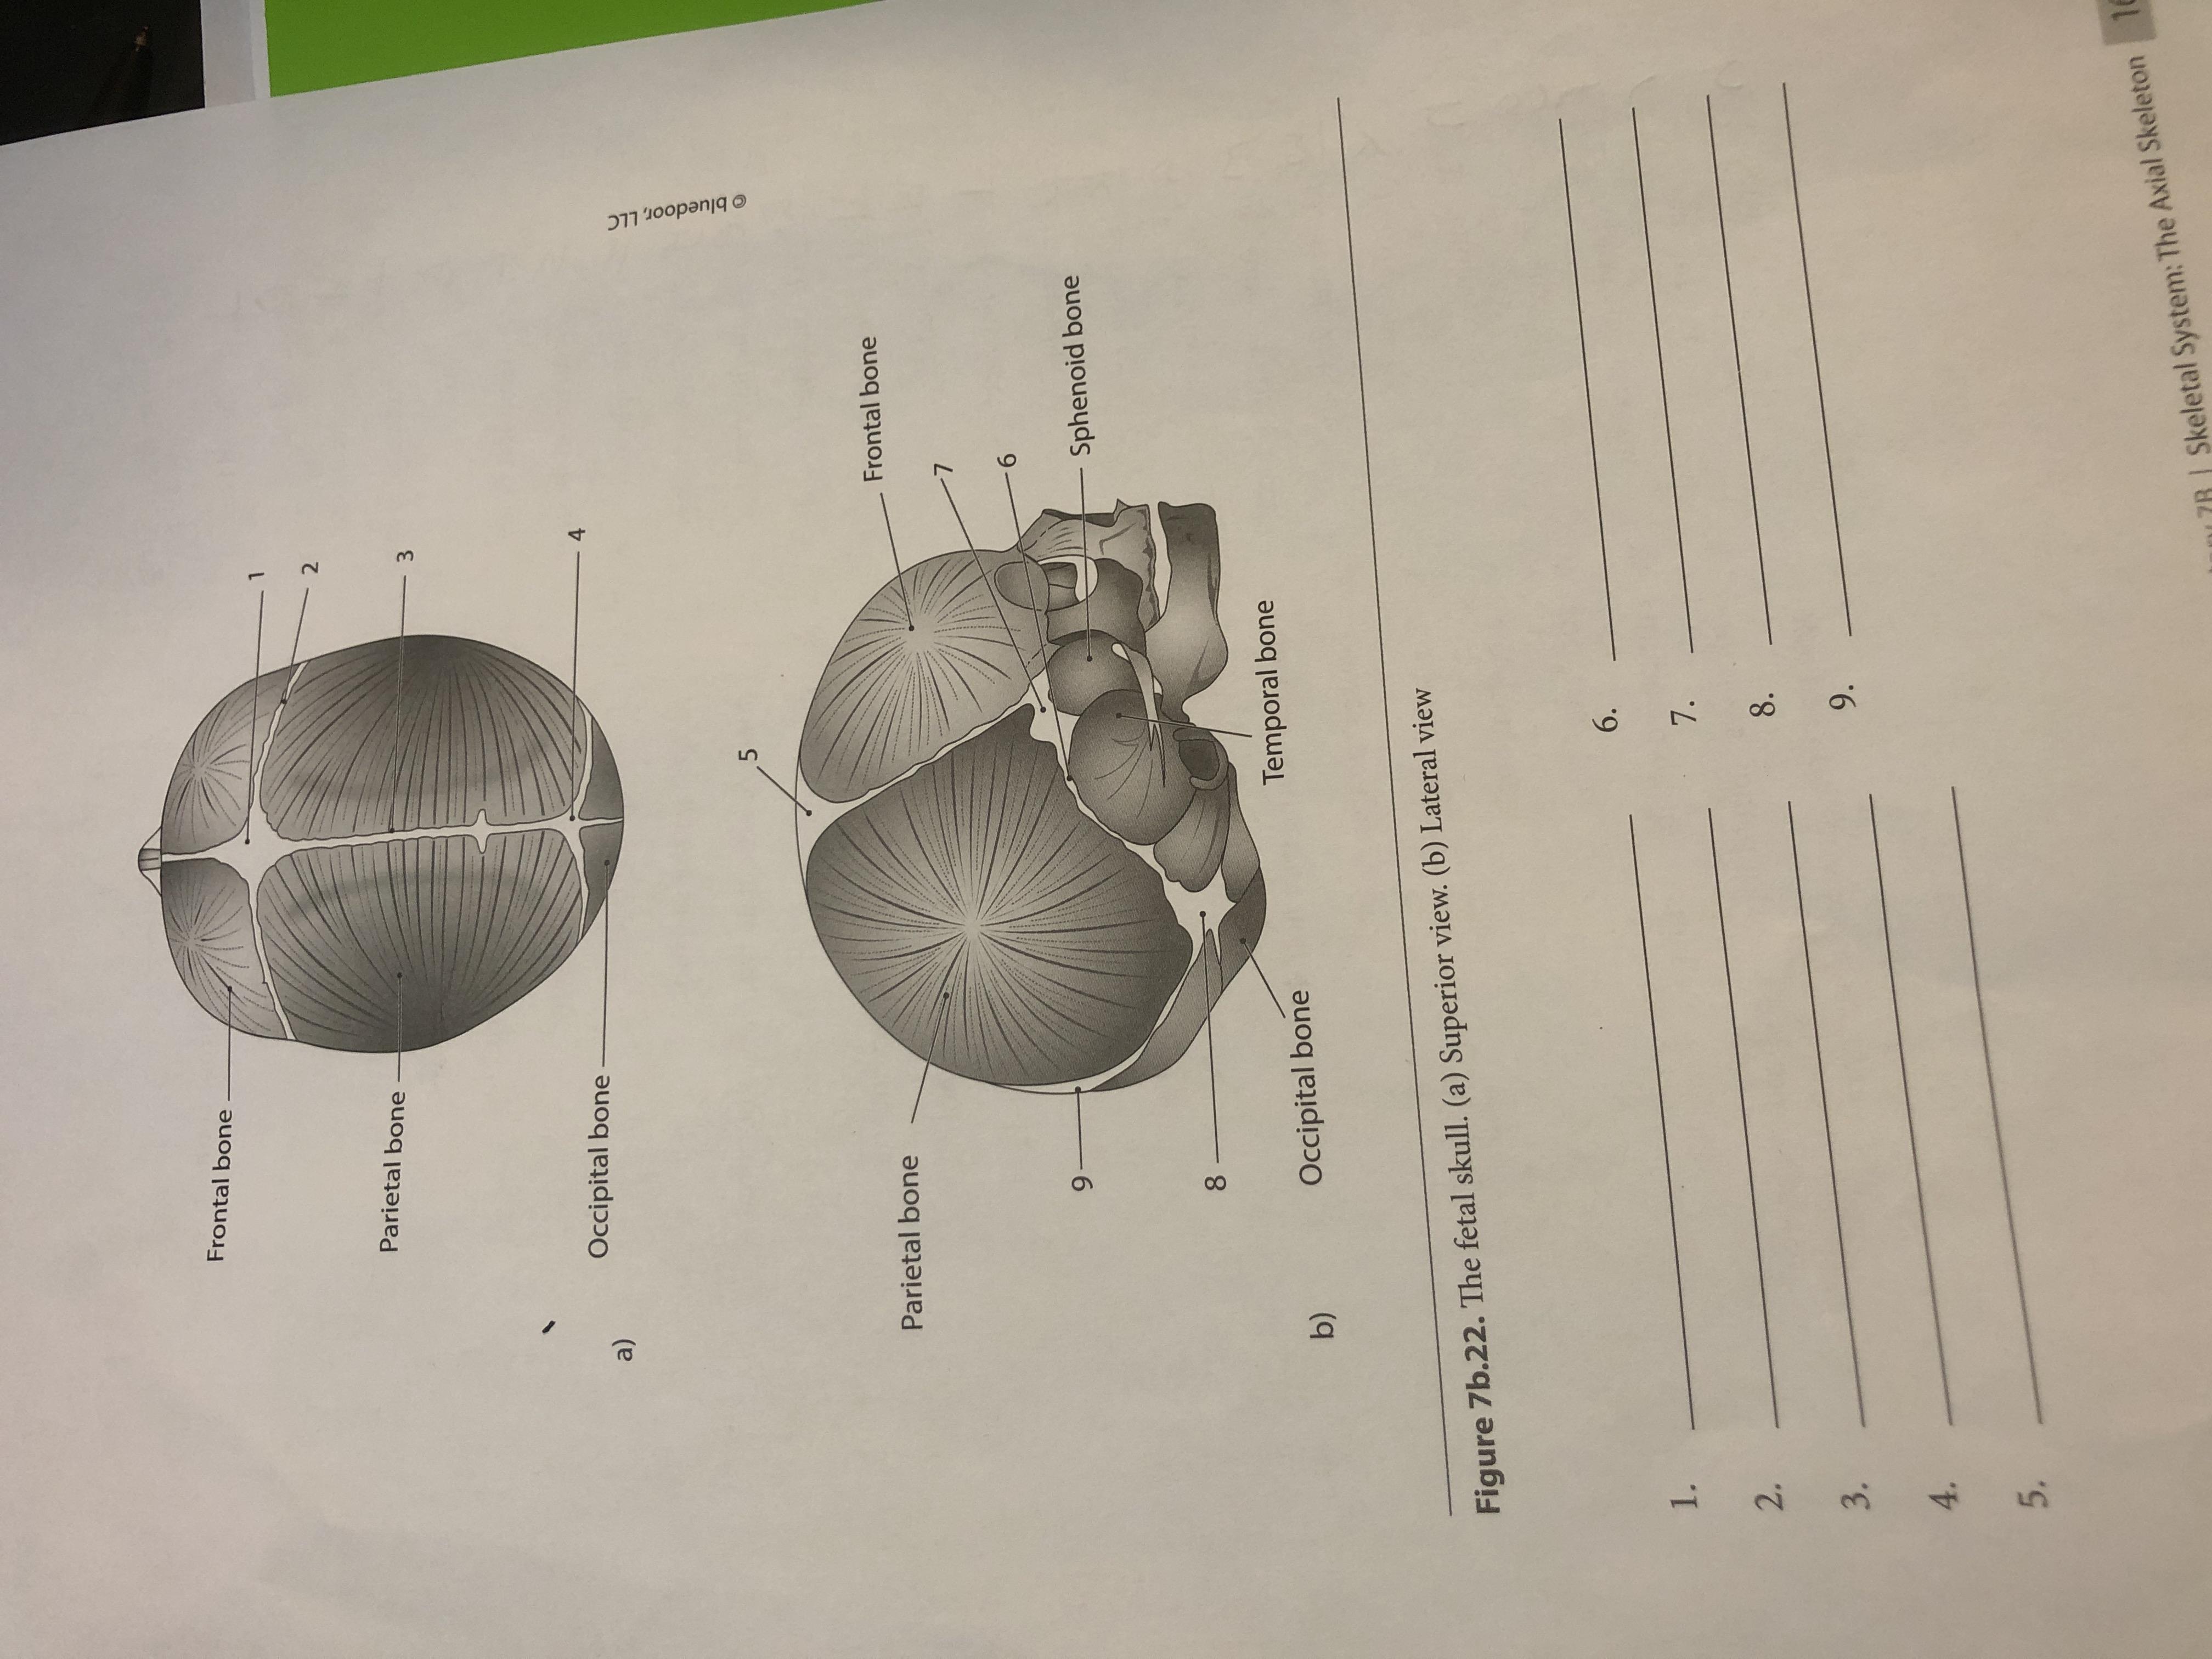 Answered Frontal Bone Parietal Bone 3 Occipital